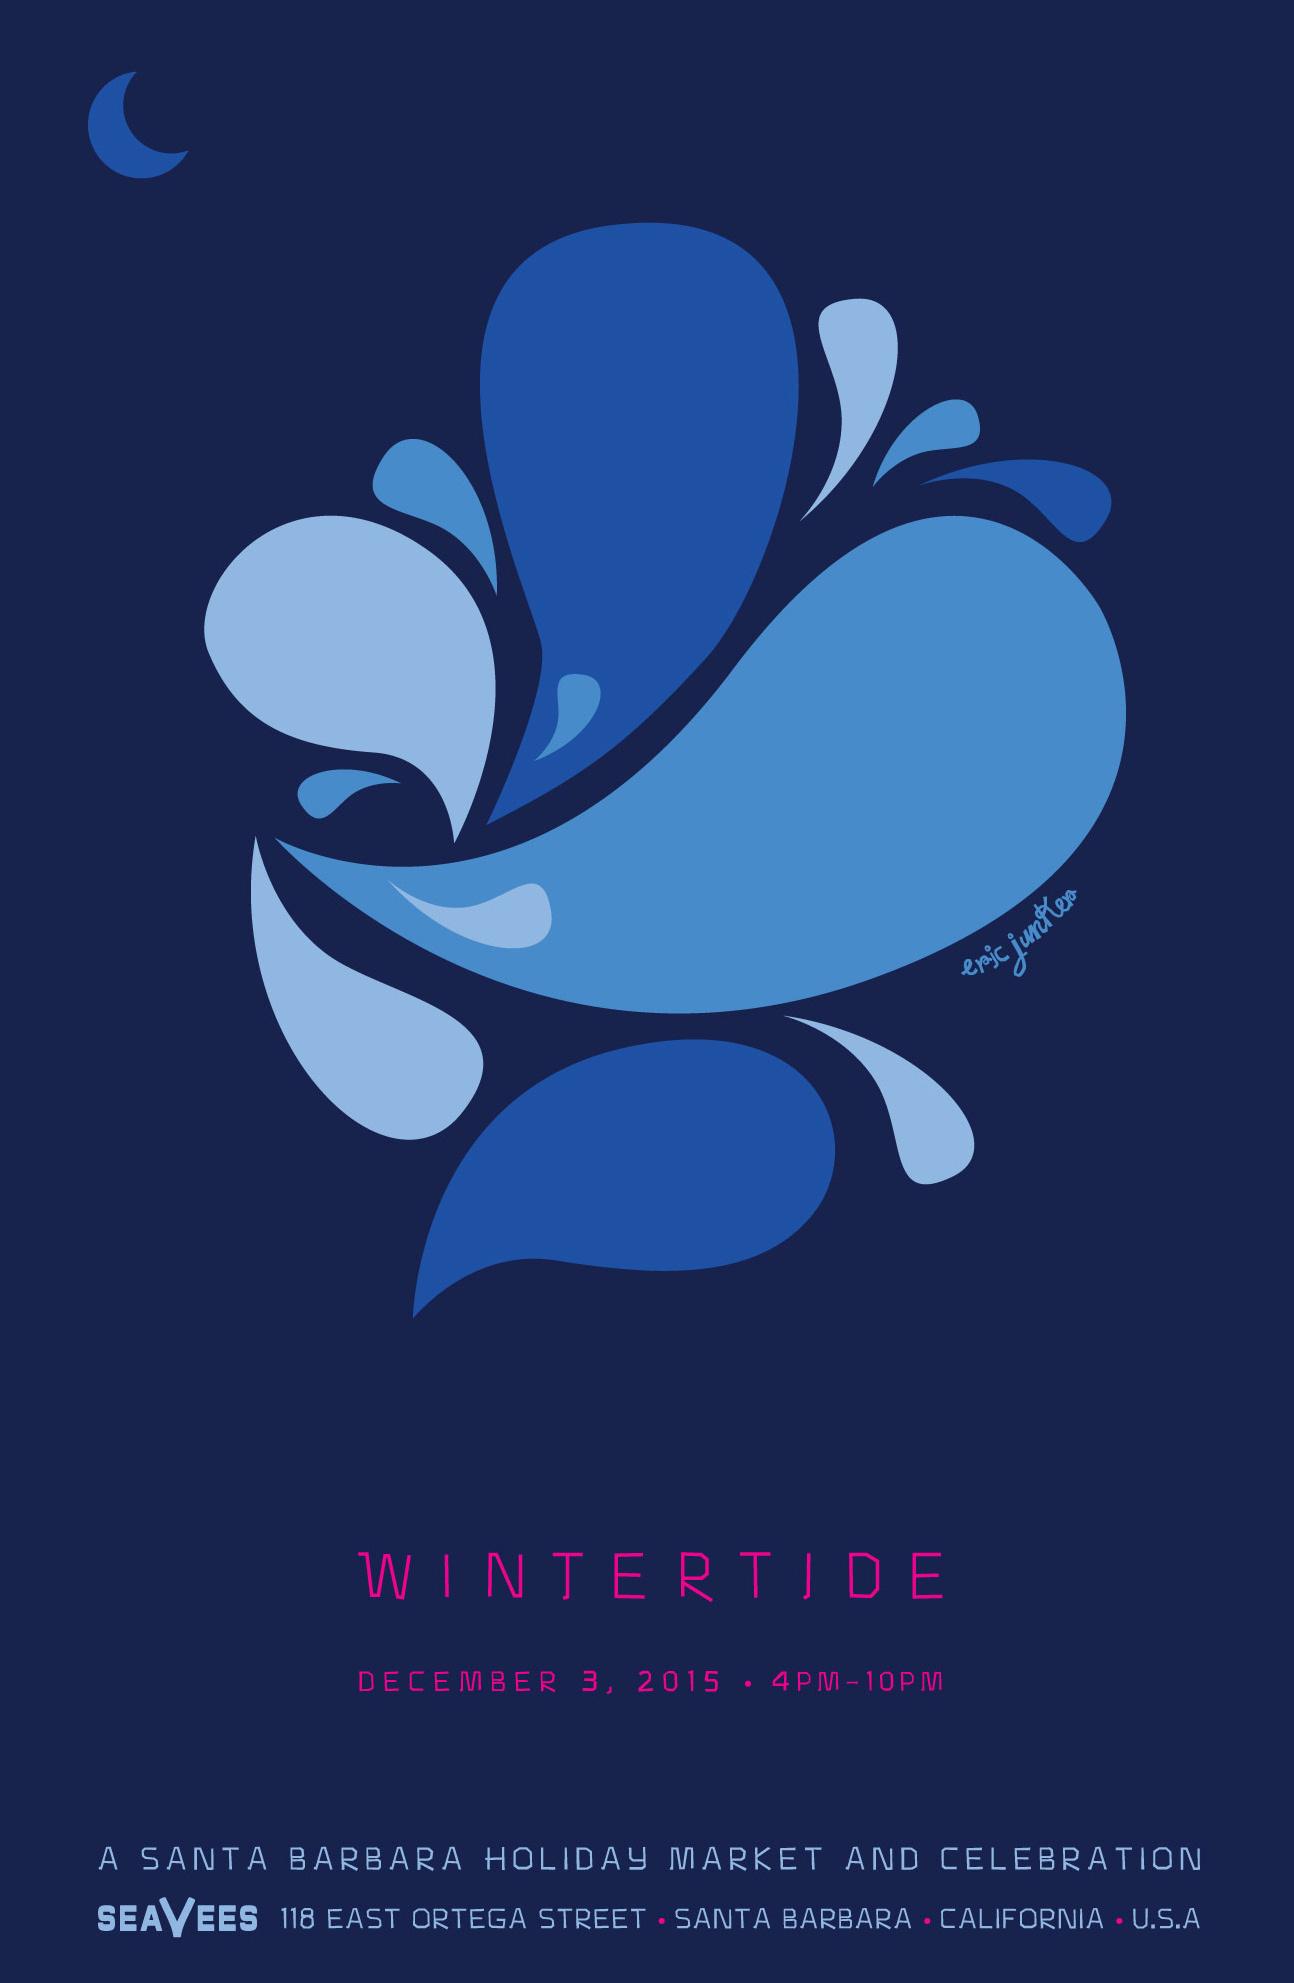 Killscrow at SeaVees Wintertide 2015